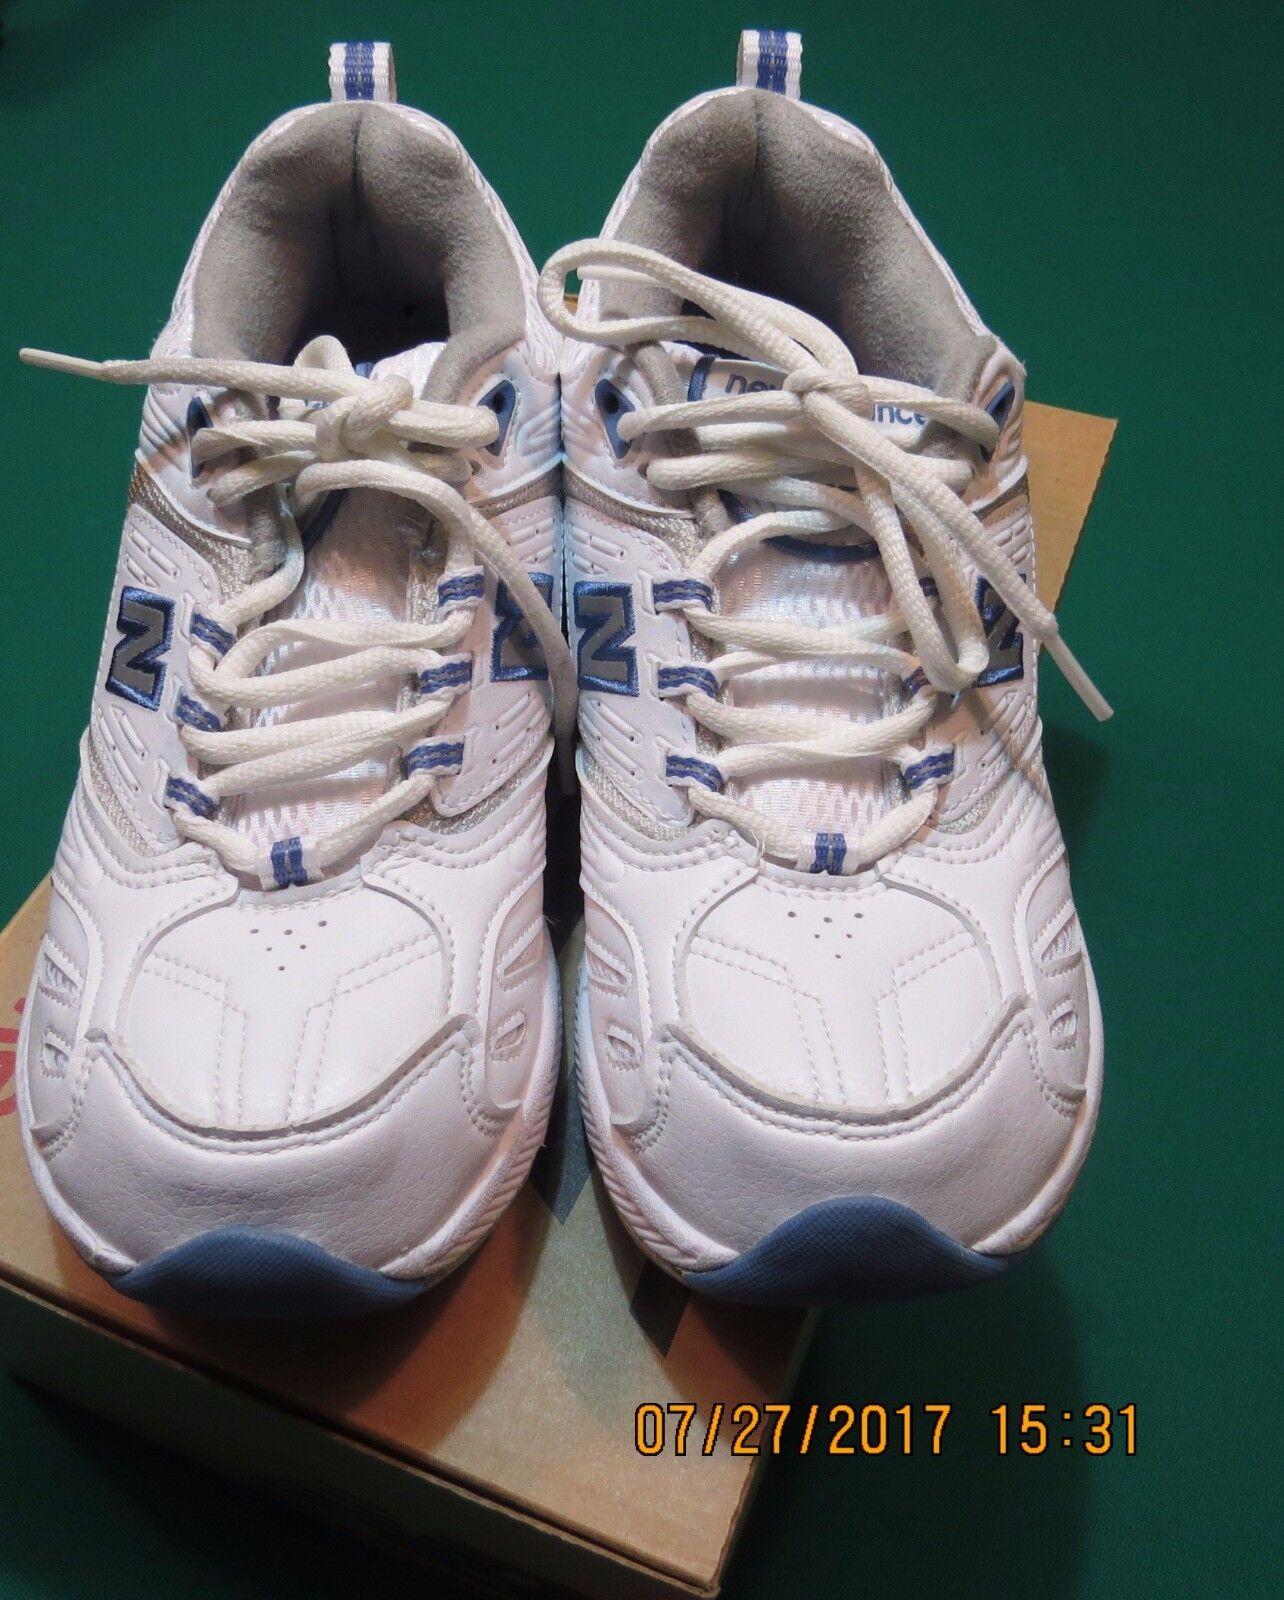 New Balance 845 Susan G Komen Breast Cancer shoes White 7 2A Narrow Abzorb